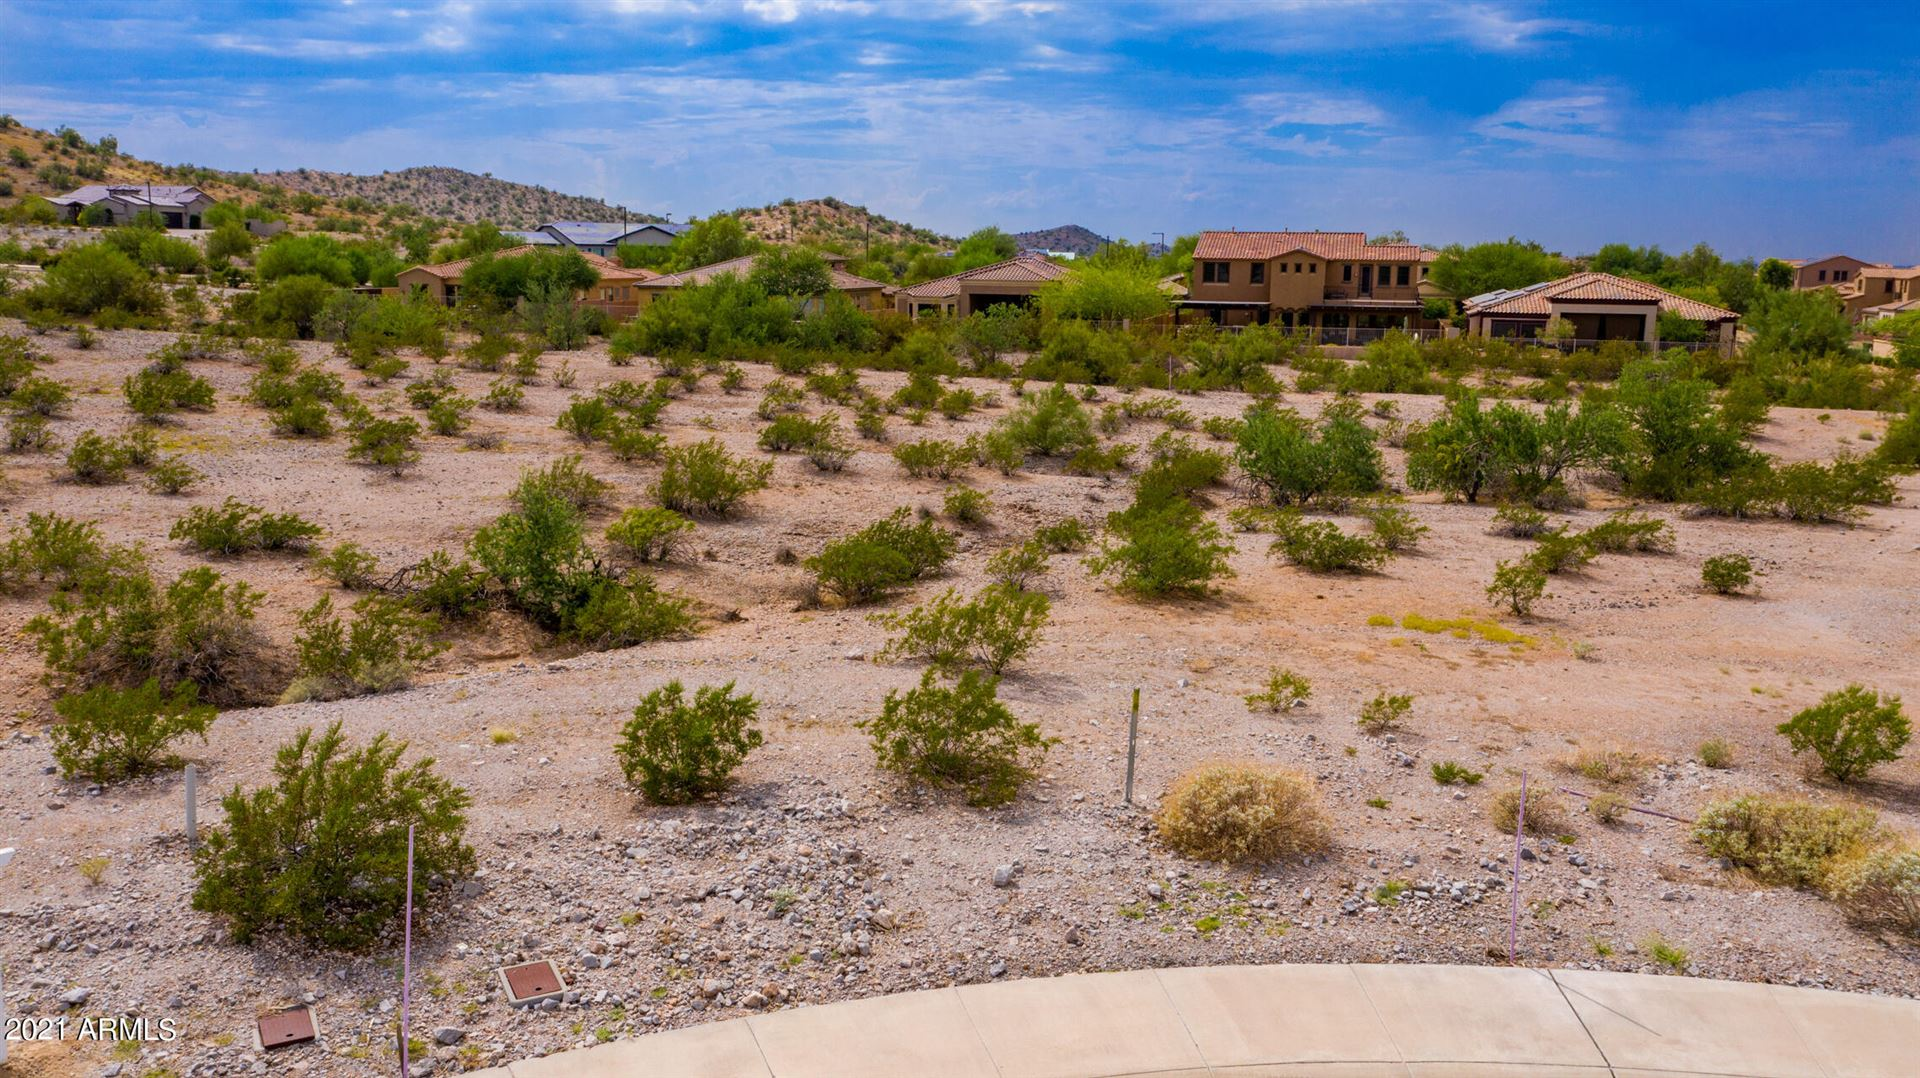 Photo of 17736 W PASEO Way, Goodyear, AZ 85338 (MLS # 6295748)